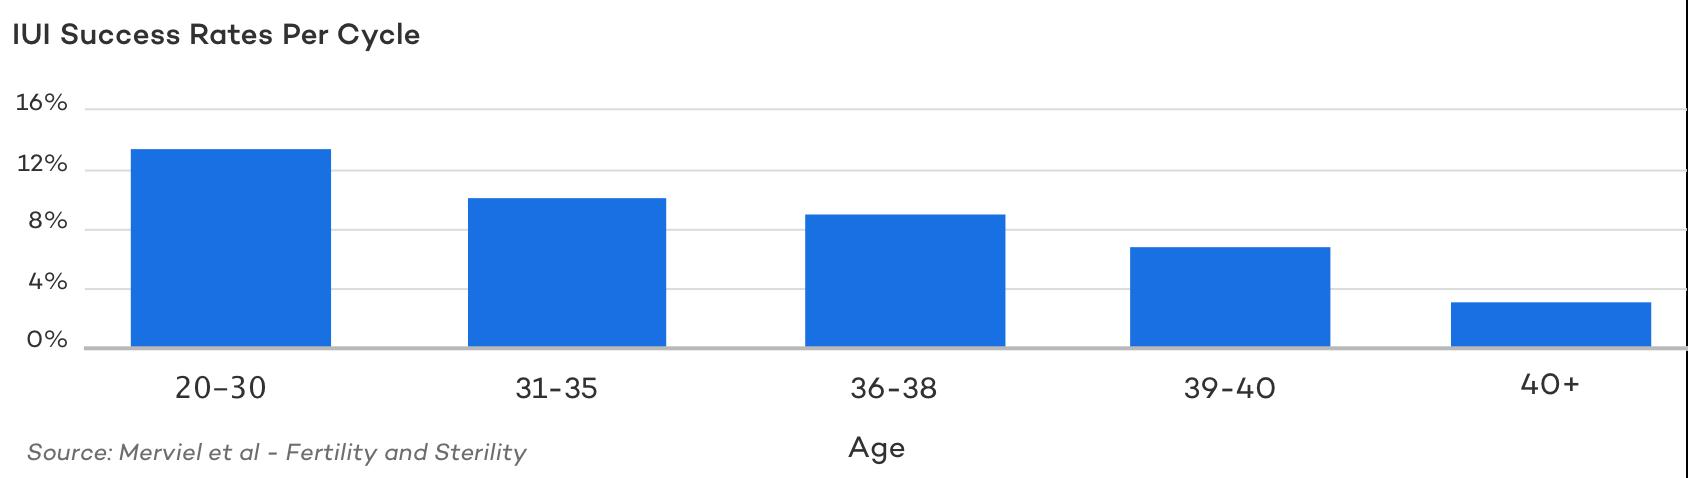 IUI Success Rates Per Cycle